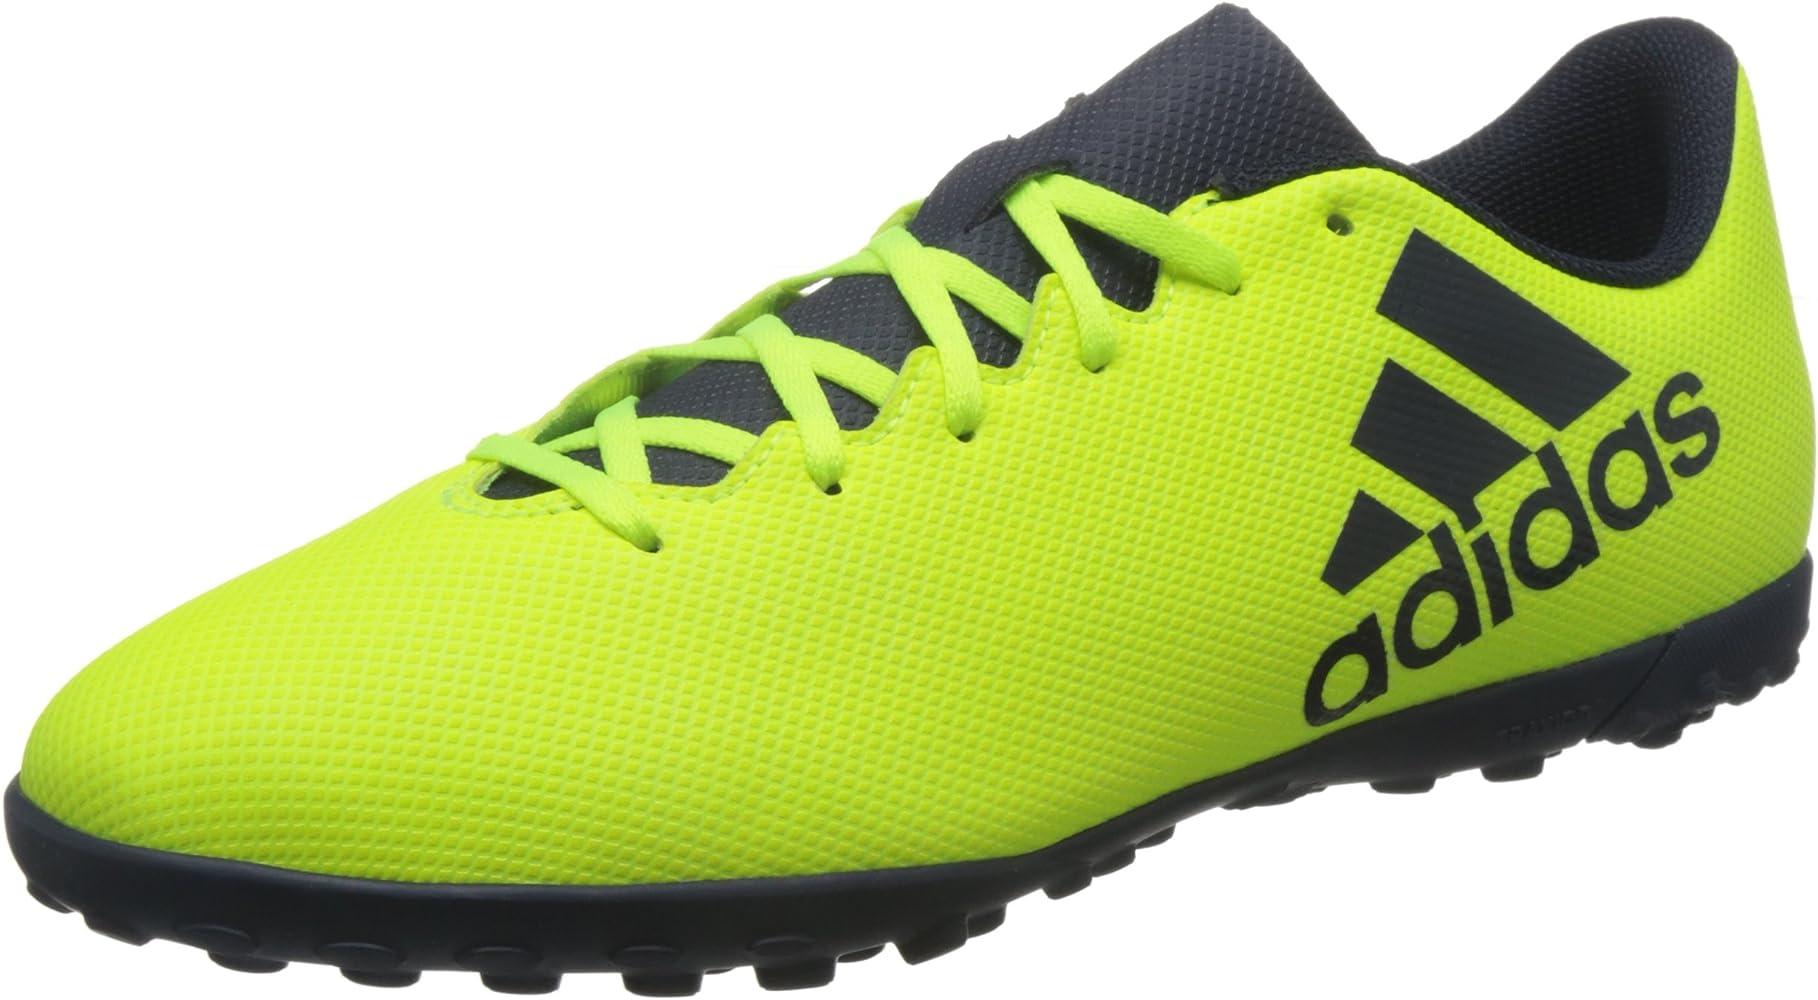 Hecho para recordar escucho música información  Amazon.com | adidas Performance Mens X 17.4 Turf Training Soccer Football  Boots - 7.5 US Yellow | Shoes